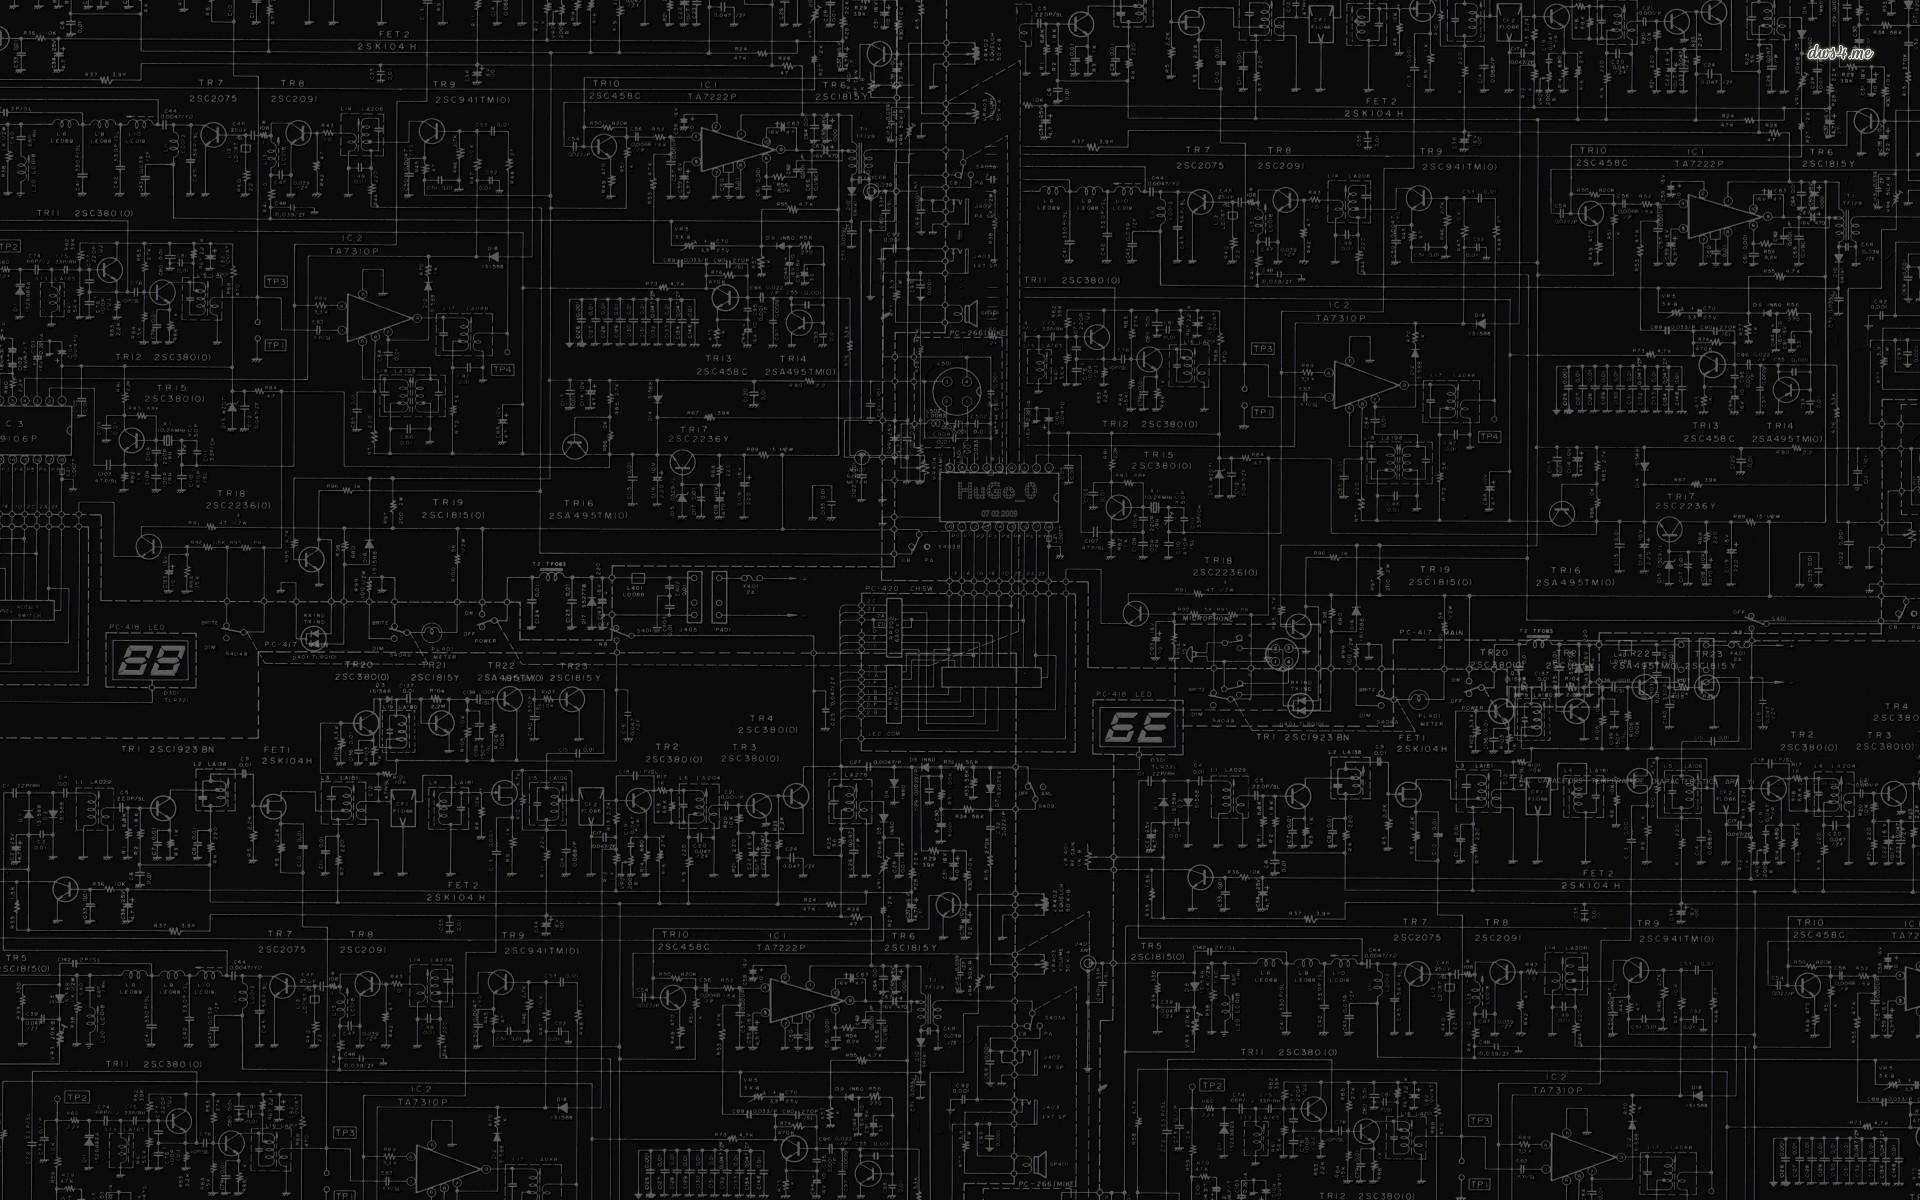 Circuit Board Wallpapers Hd 63 Images Circuits Electronic Wallpaper 1920x1200 Arts 3840x2160 Bcircuit B Hanksrepubliccom